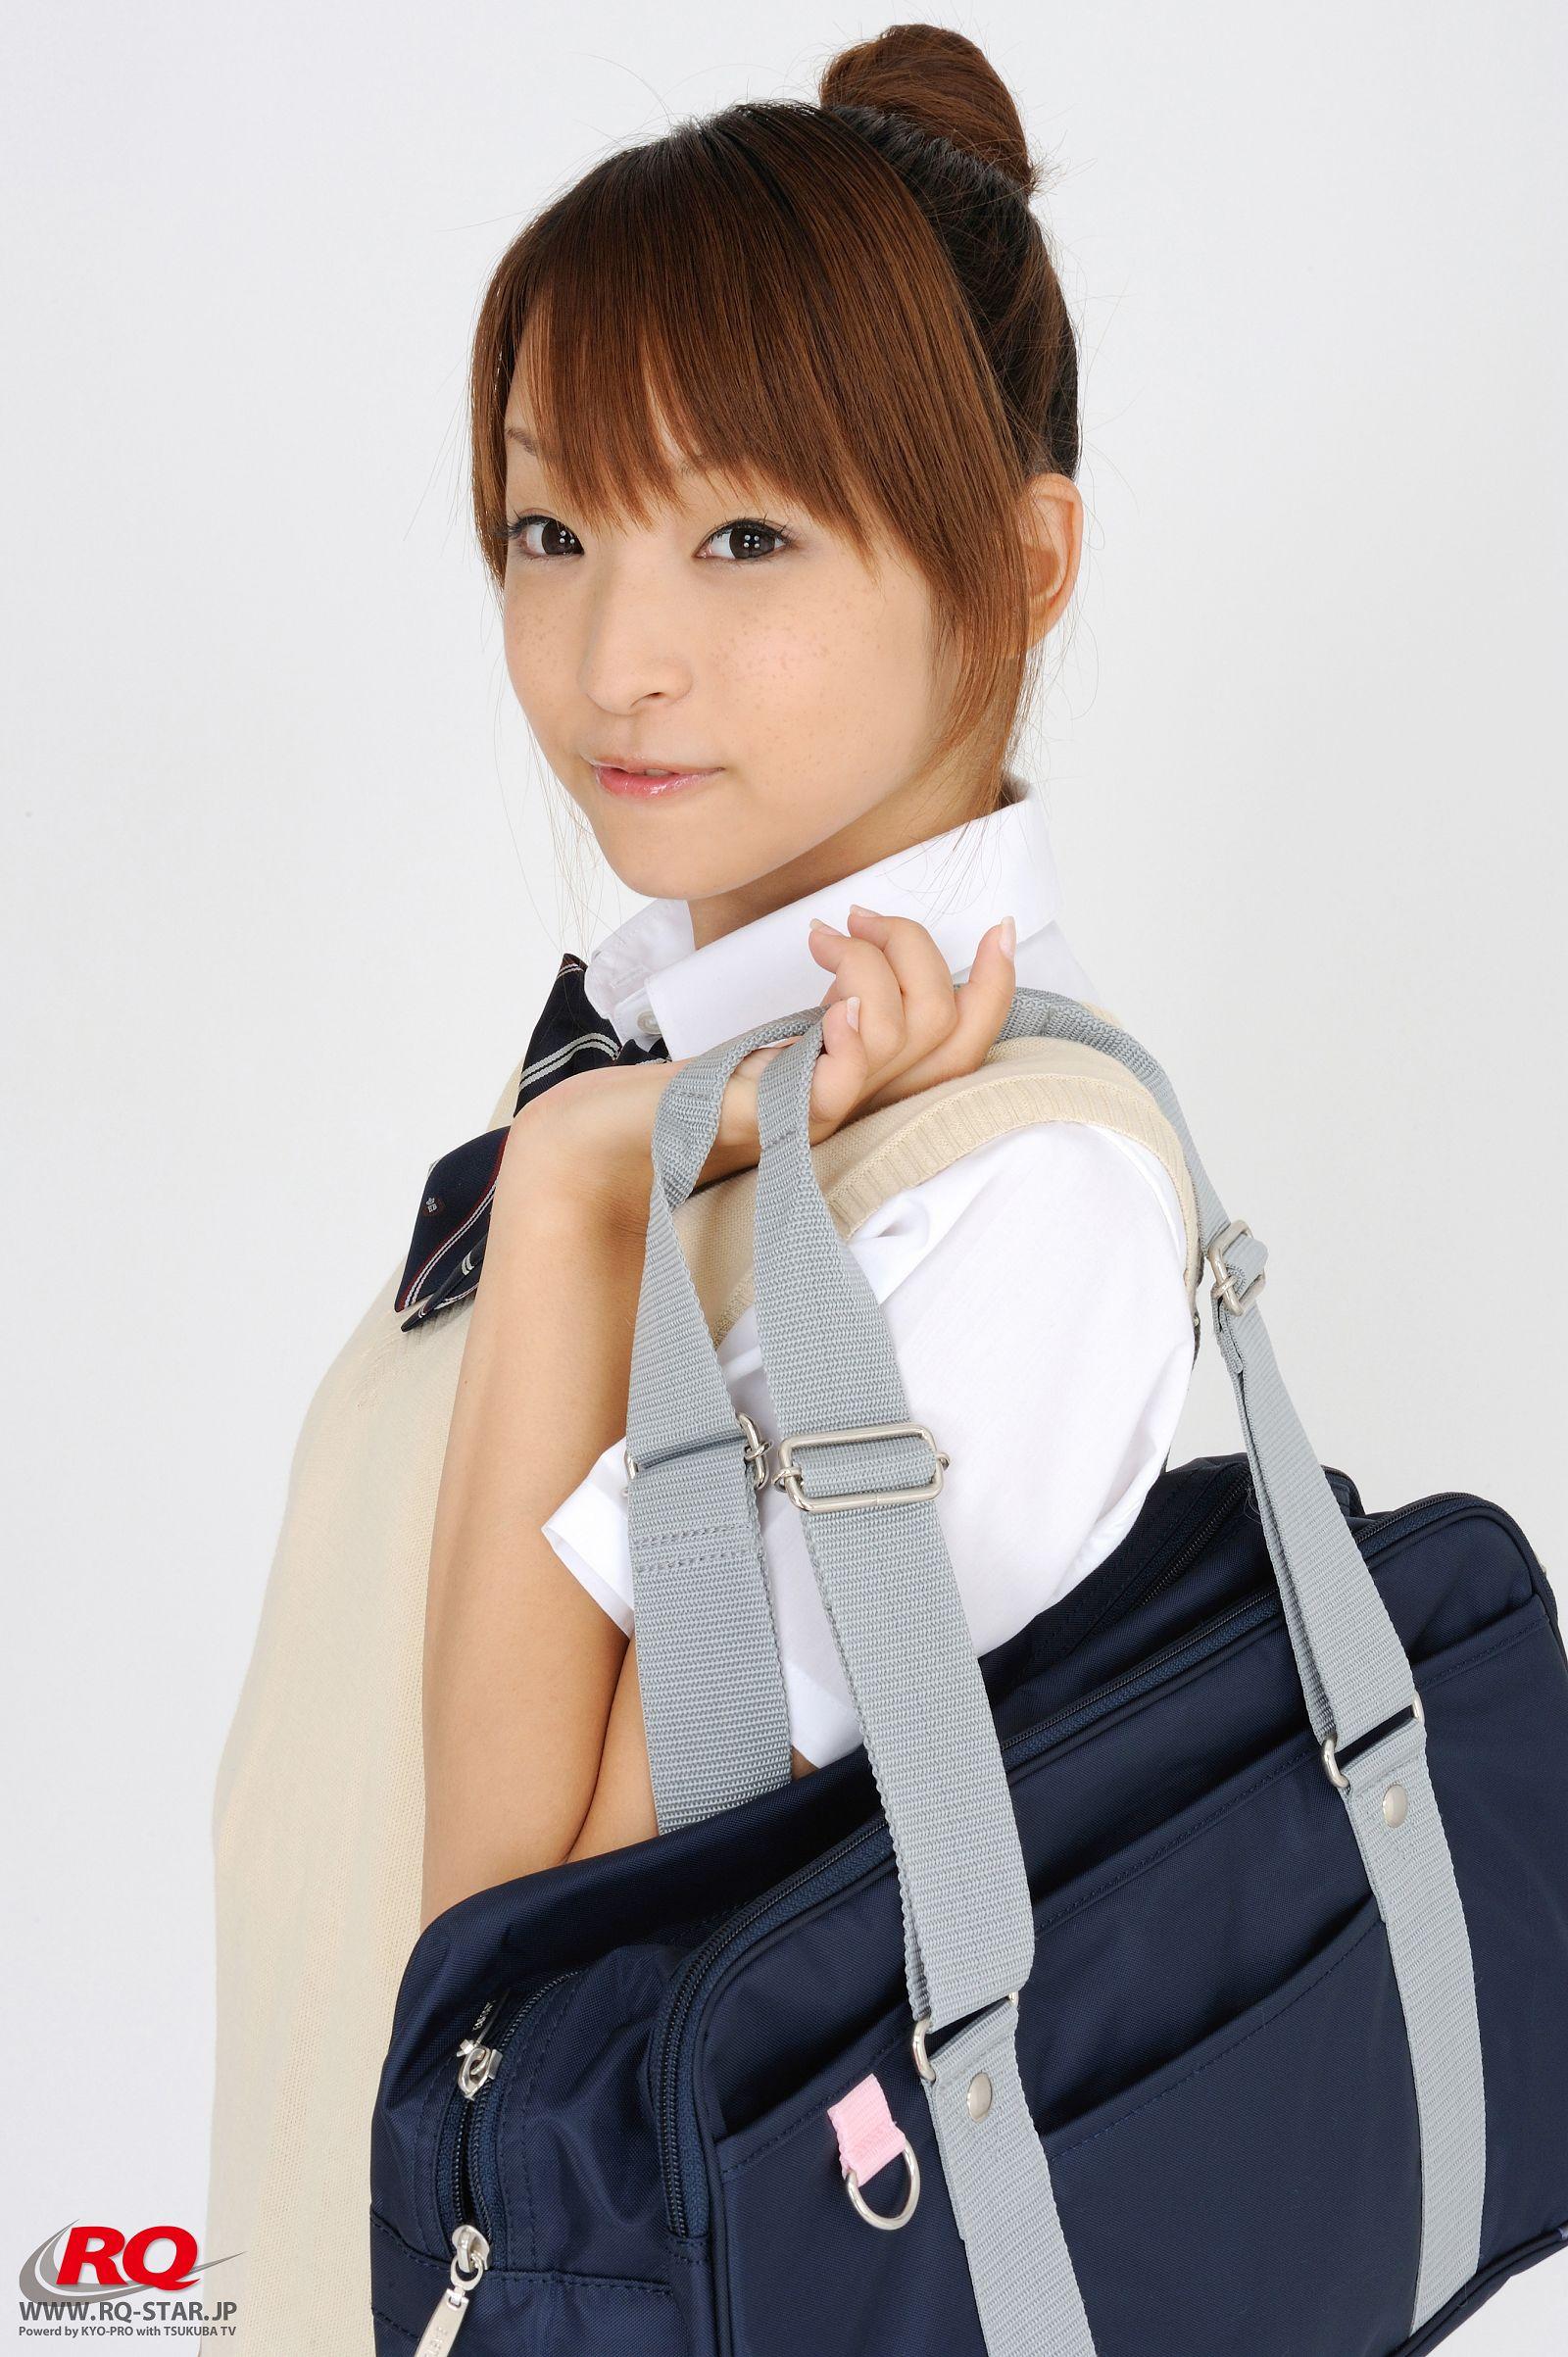 [RQ STAR美女] NO.0097 Mio Aoki 青木未央 Student Style[78P] RQ STAR 第3张